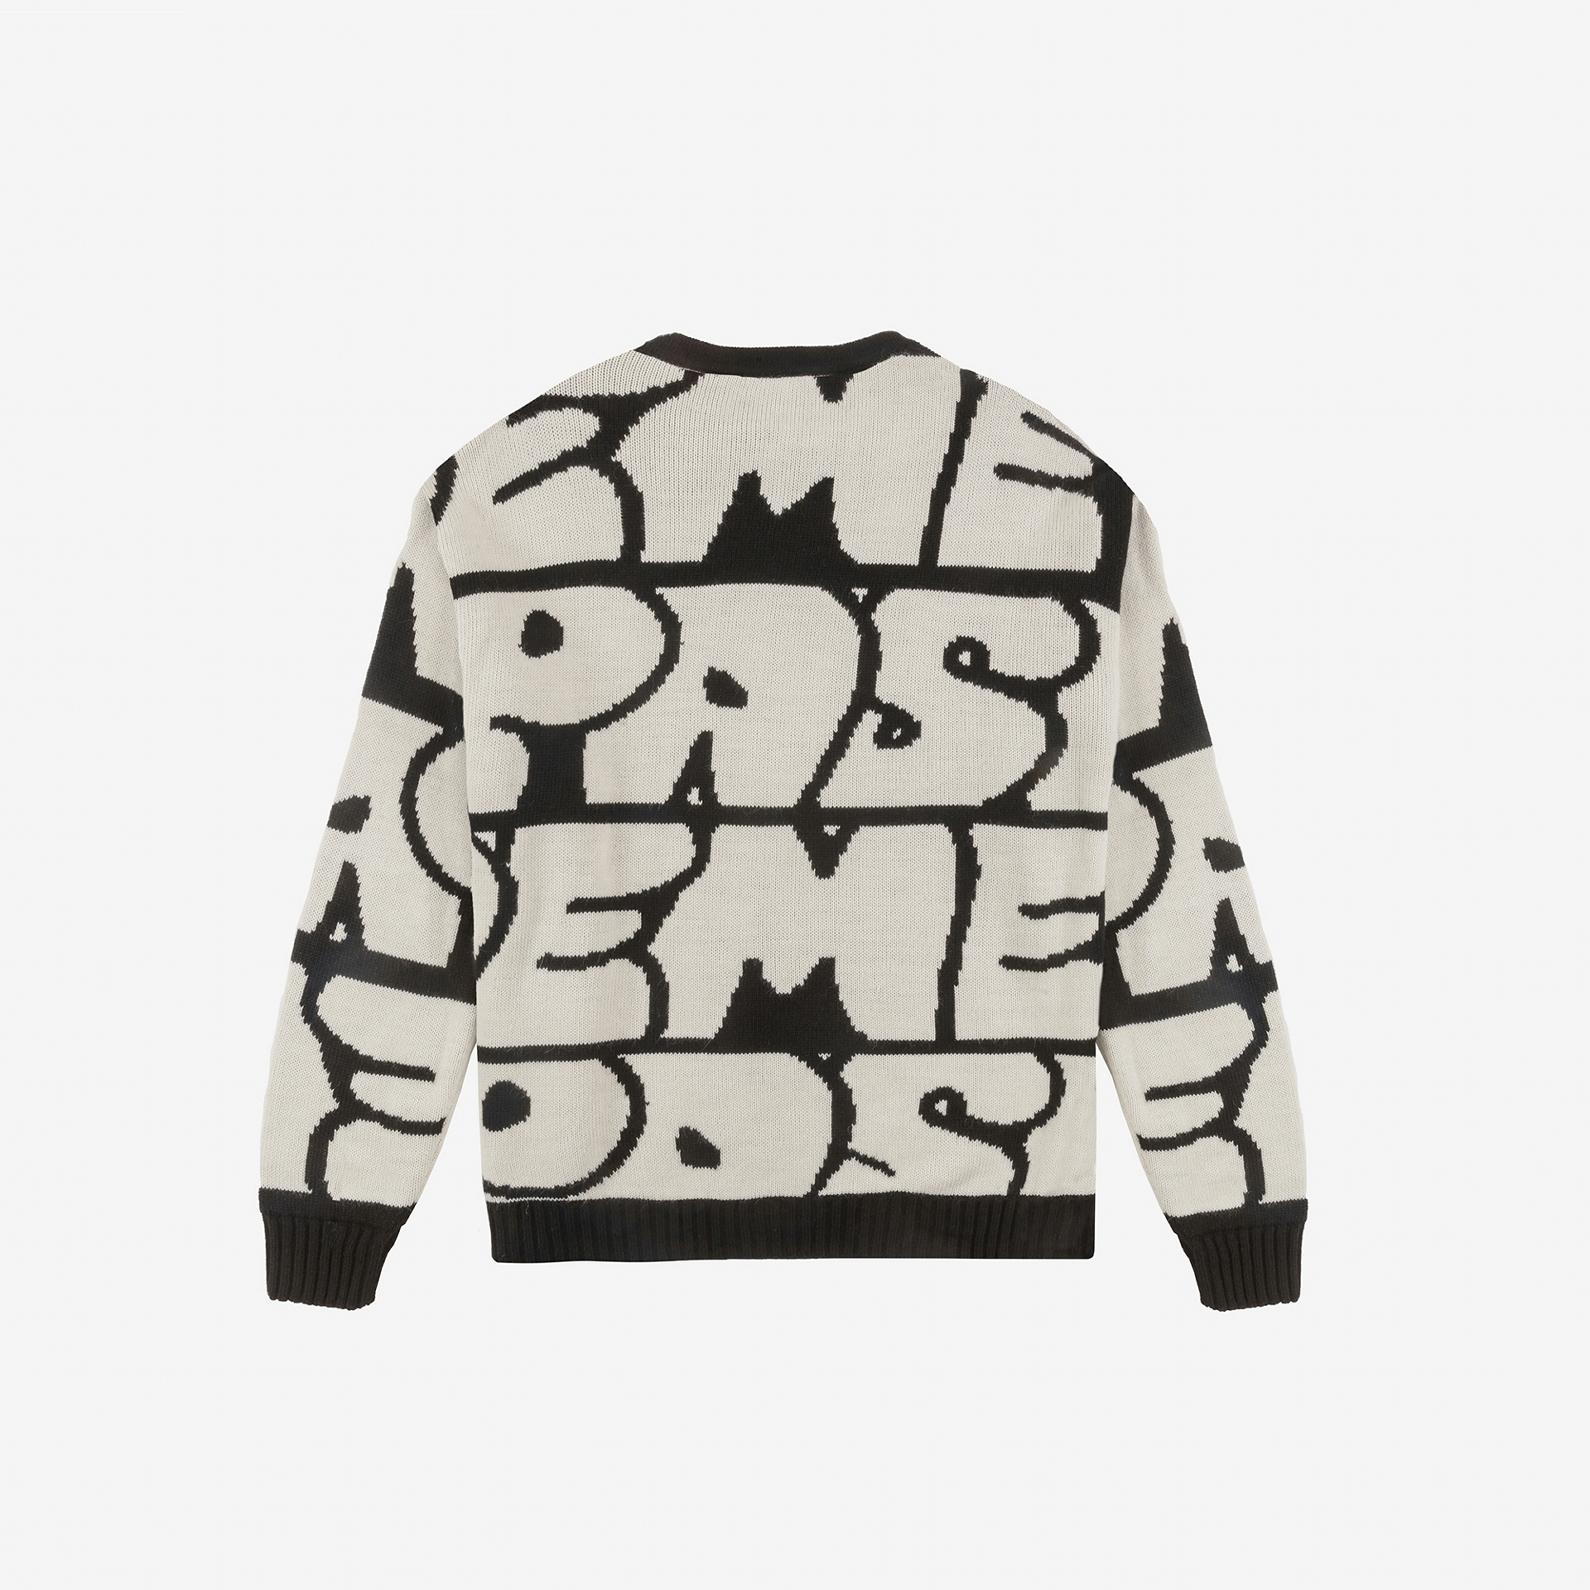 【PAS DE MER/パドゥメ】GRAFFITI JAQUARD KNIT ニットセーター / PATTERN